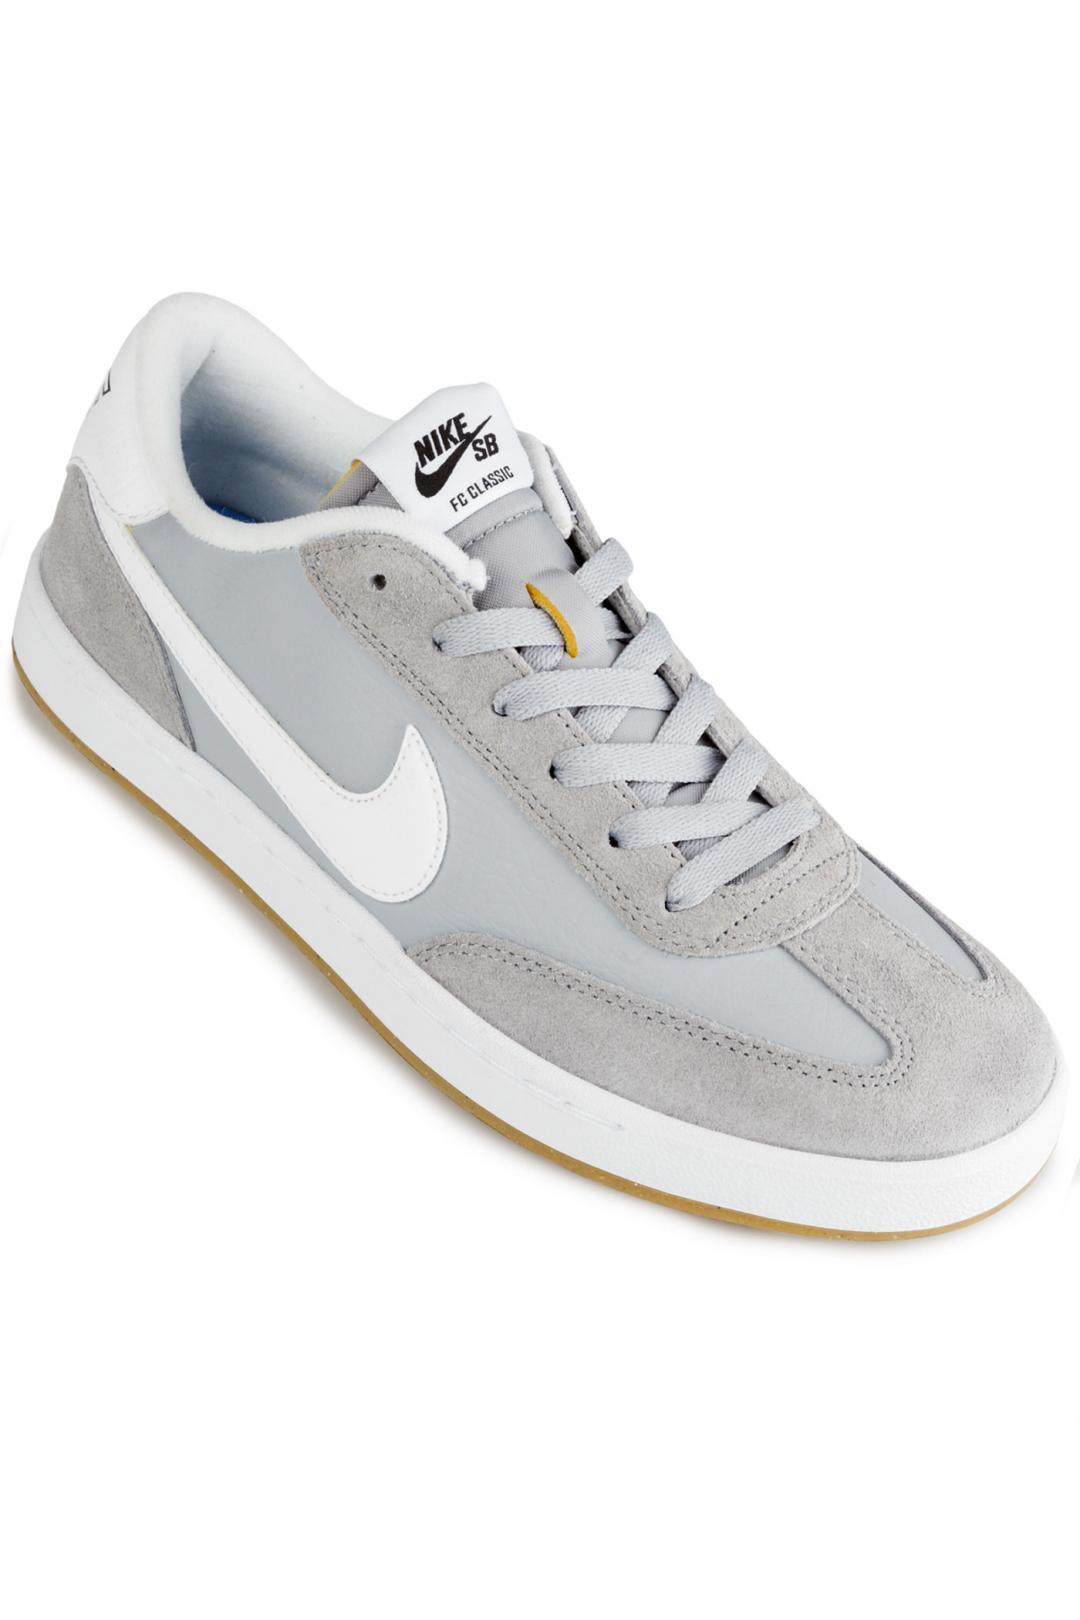 Uomo Nike SB FC Classic wolf grey white   Scarpe da skate